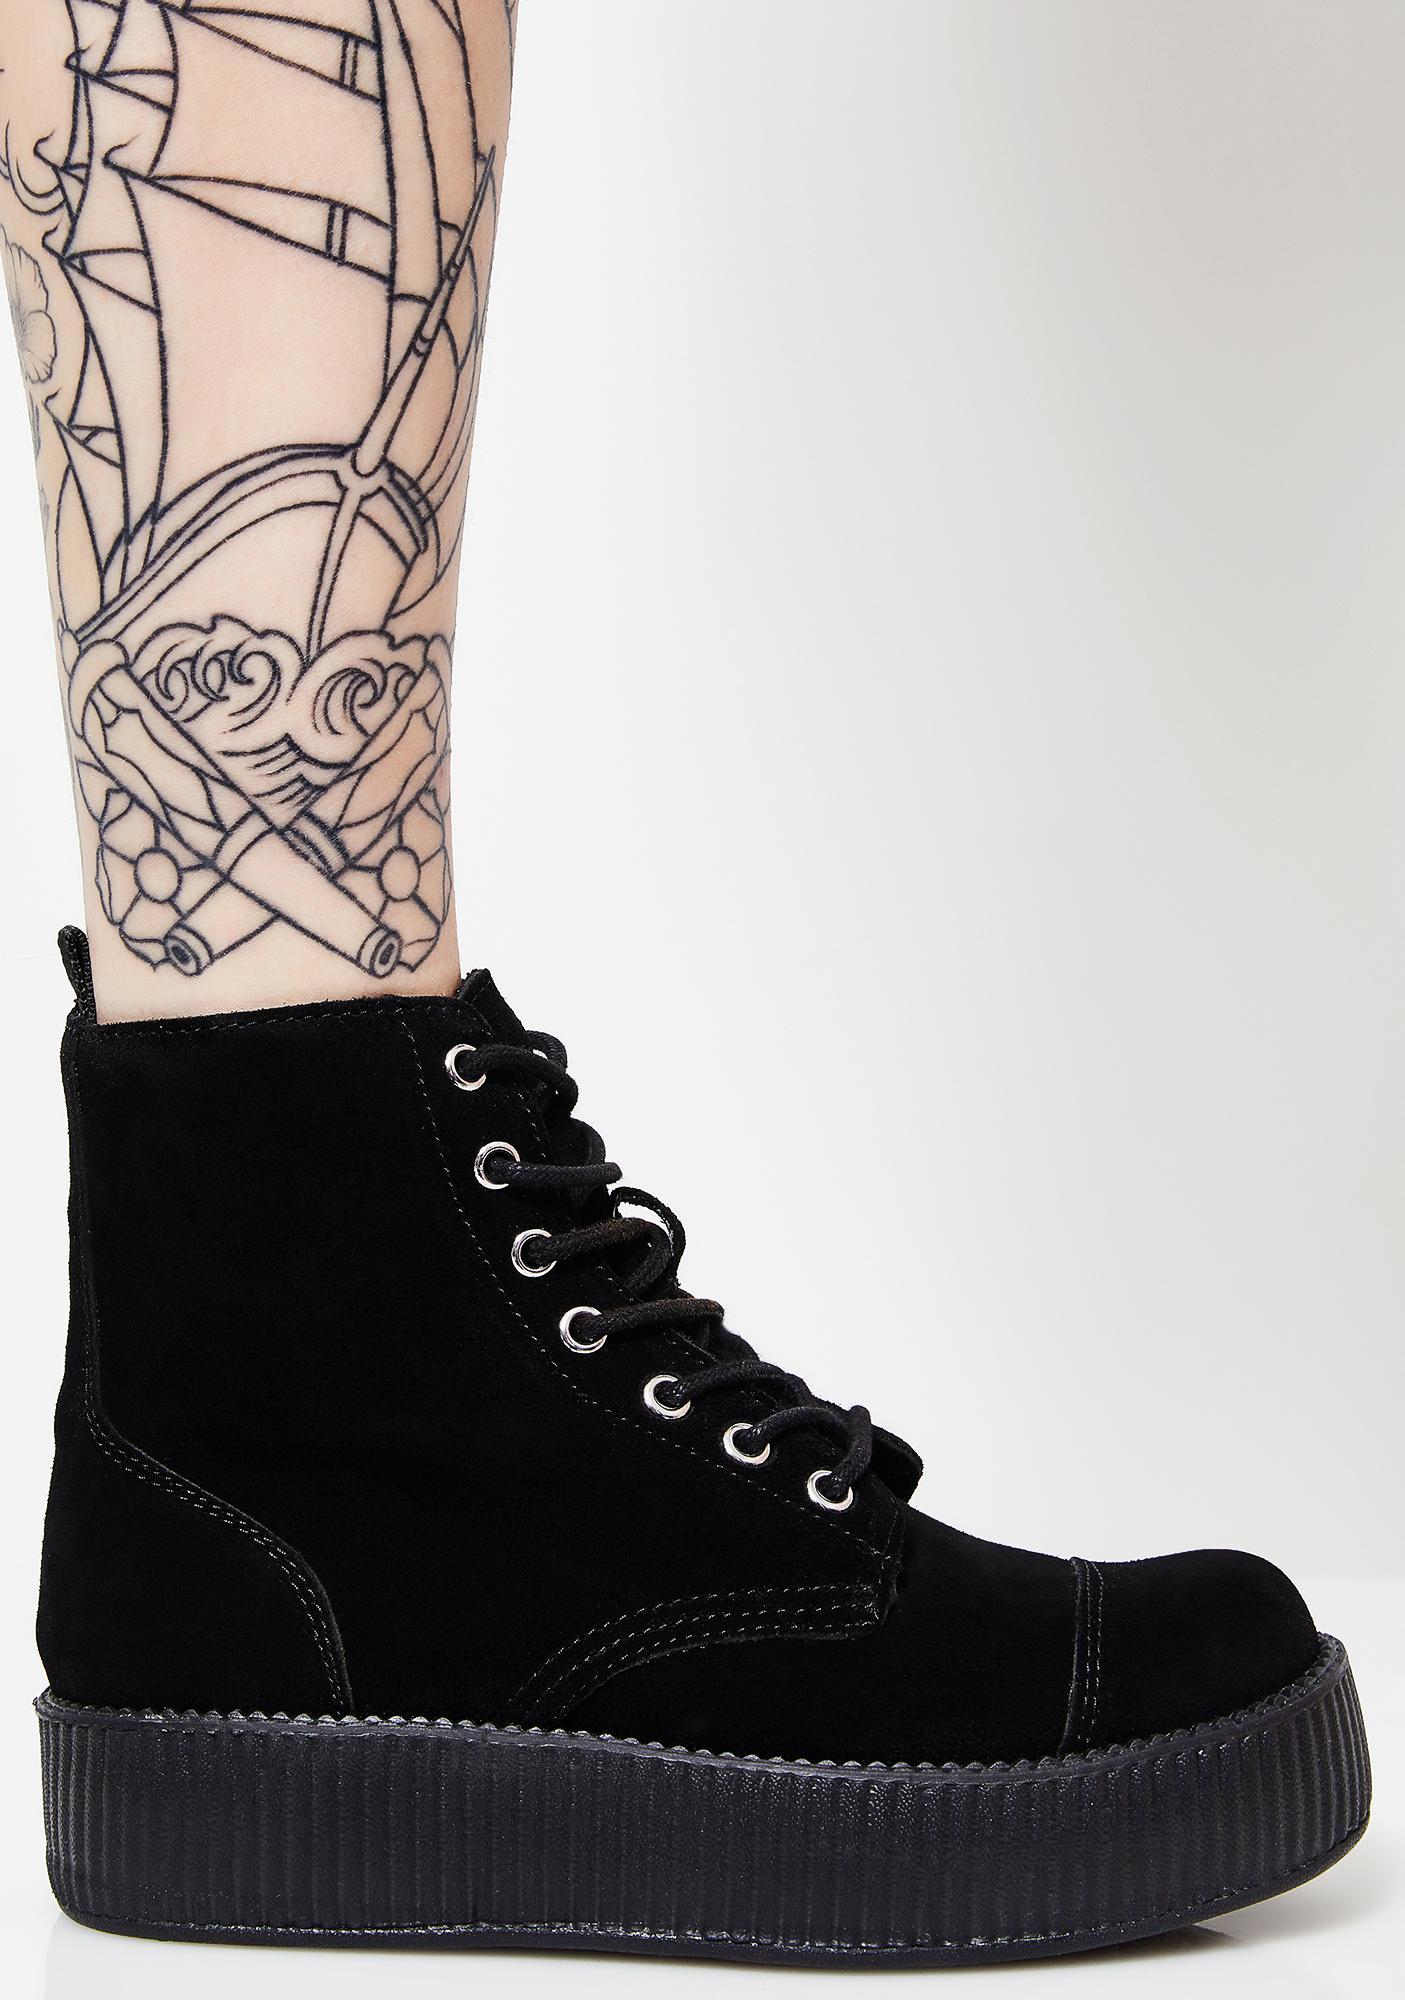 3375a62603c T.U.K. Suede 7 Eye Mondo Creeper Boots